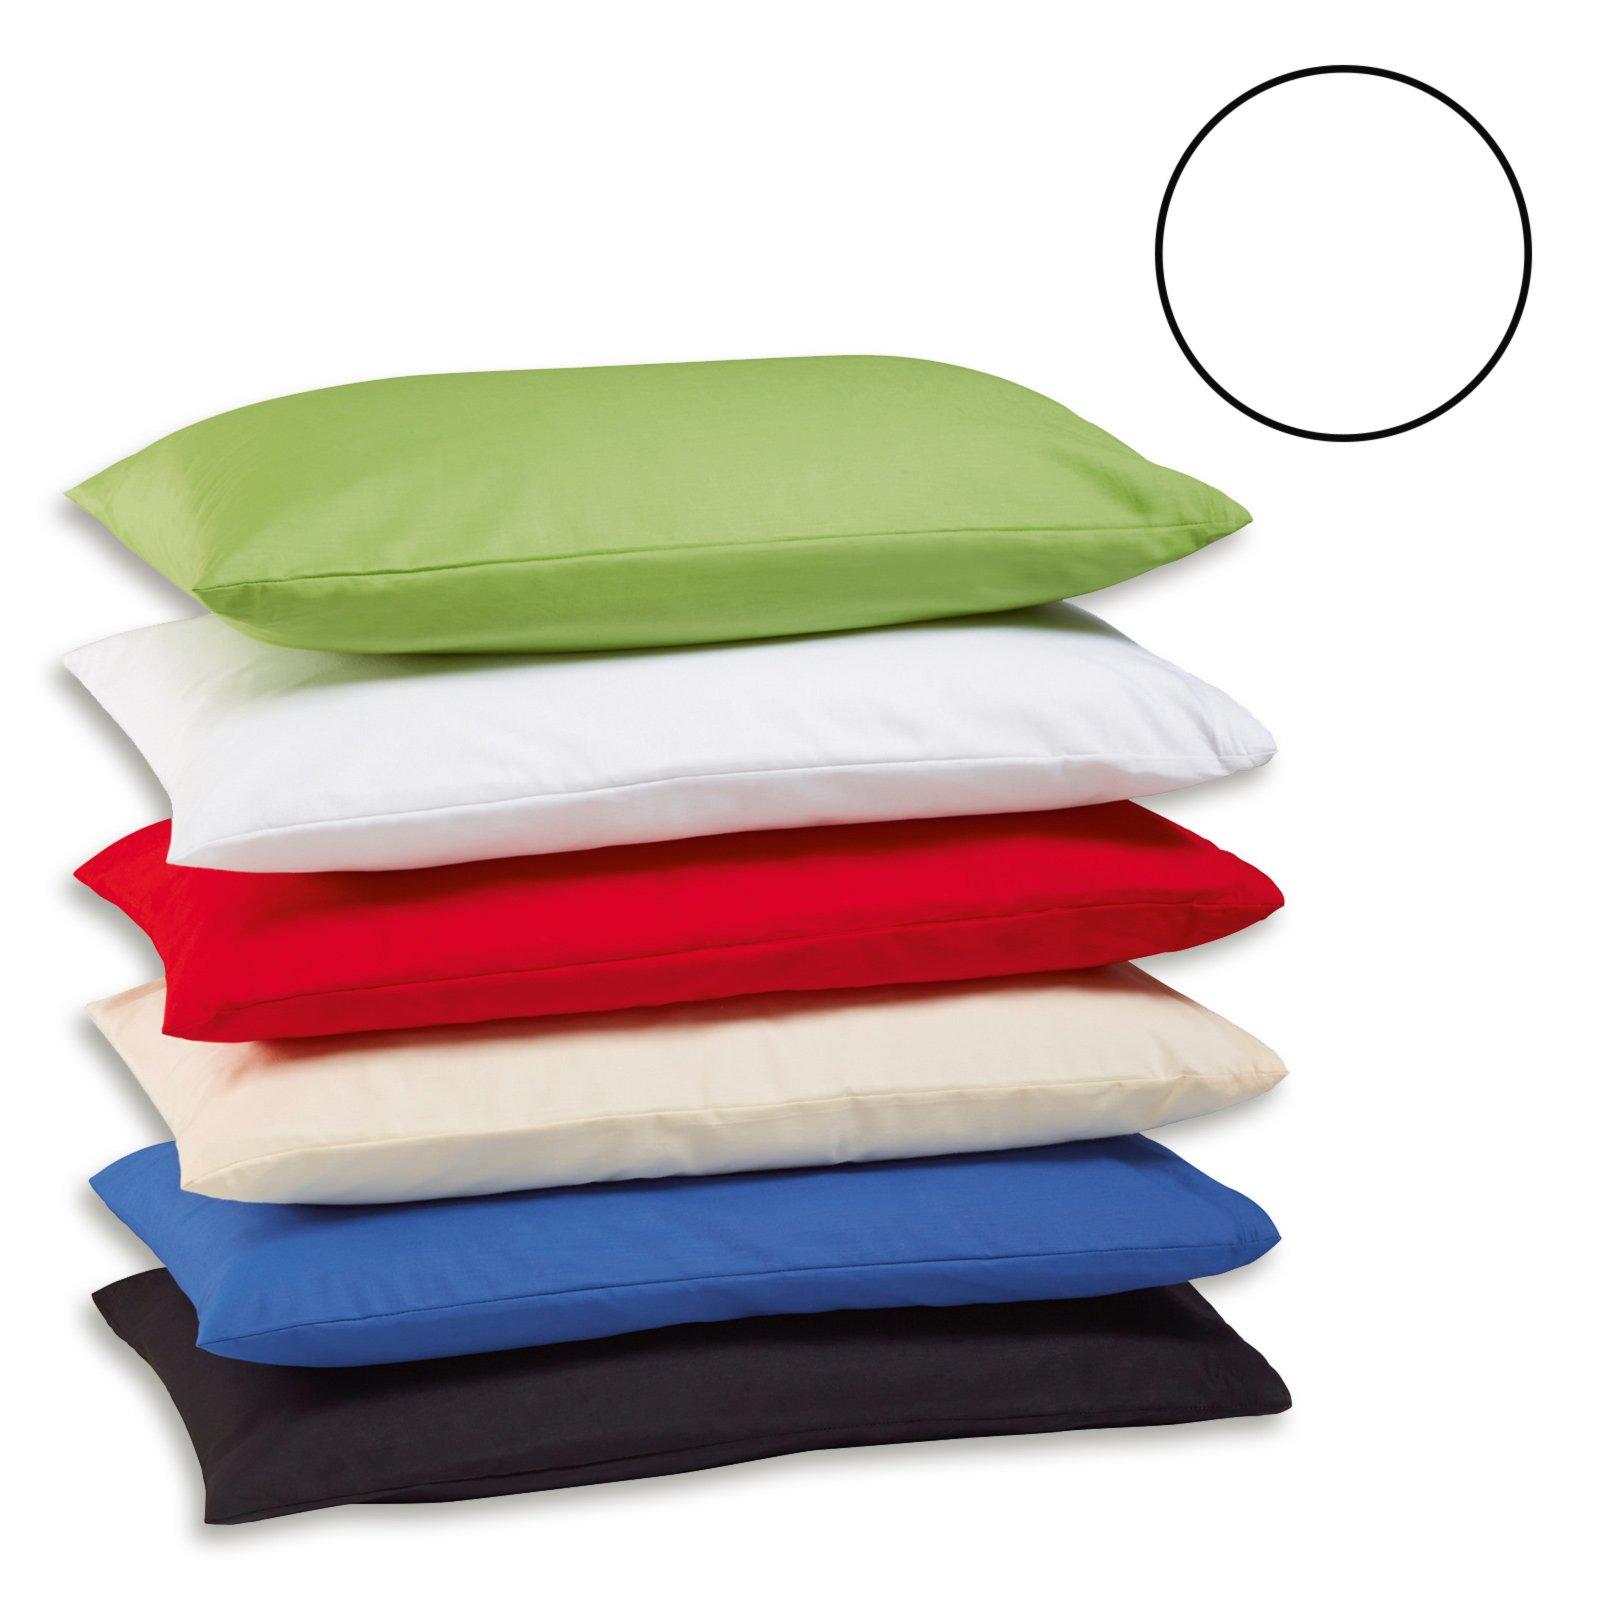 2er pack kissenbezug exclusiv wei 40x40 cm bettw sche bettw sche bettlaken. Black Bedroom Furniture Sets. Home Design Ideas